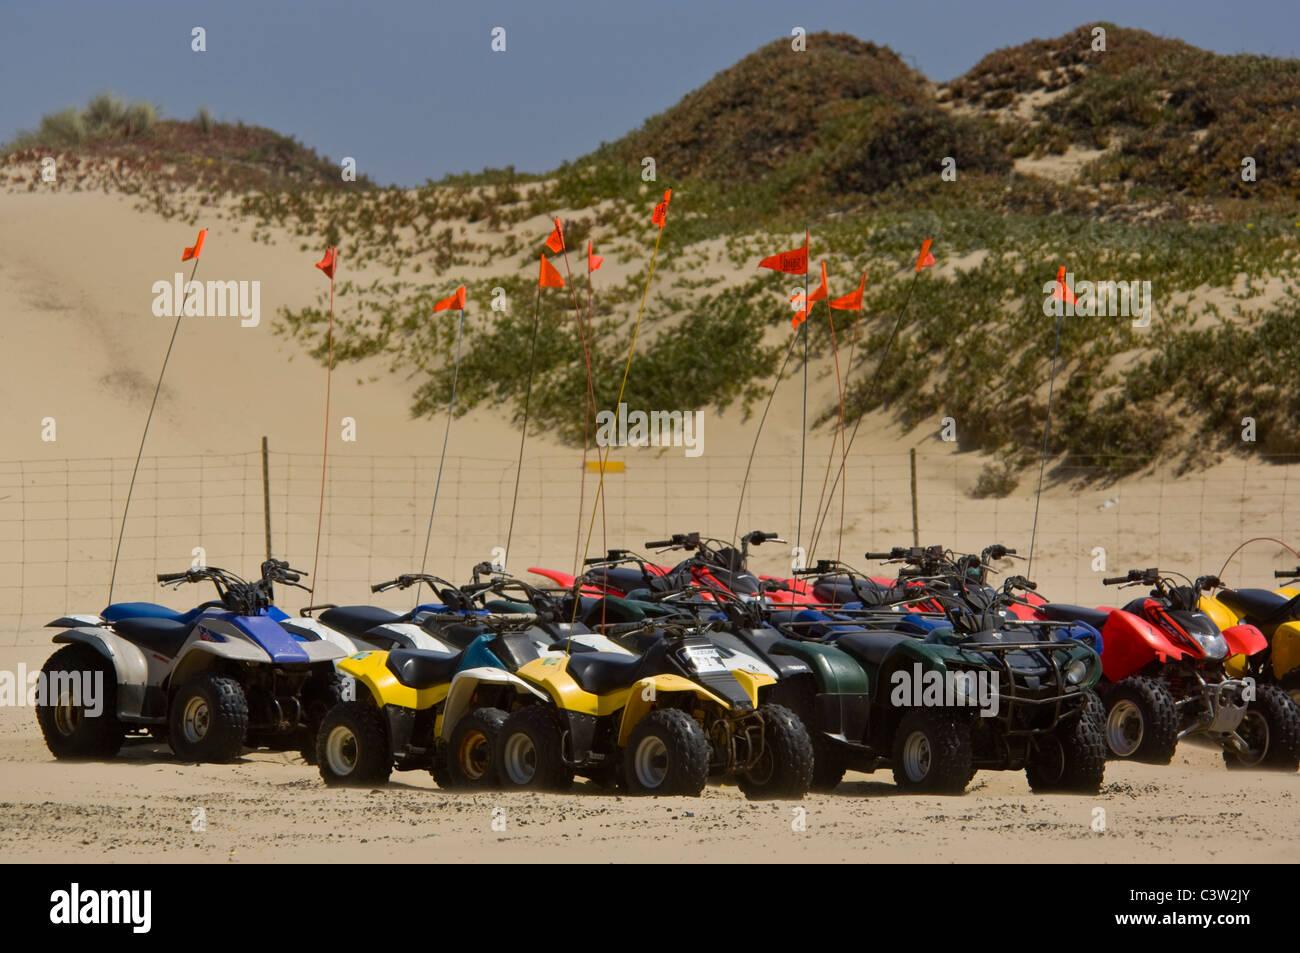 ATV sulla sabbia a Oceano Dunes State Vehicular Recreation Area, Oceano, California Immagini Stock